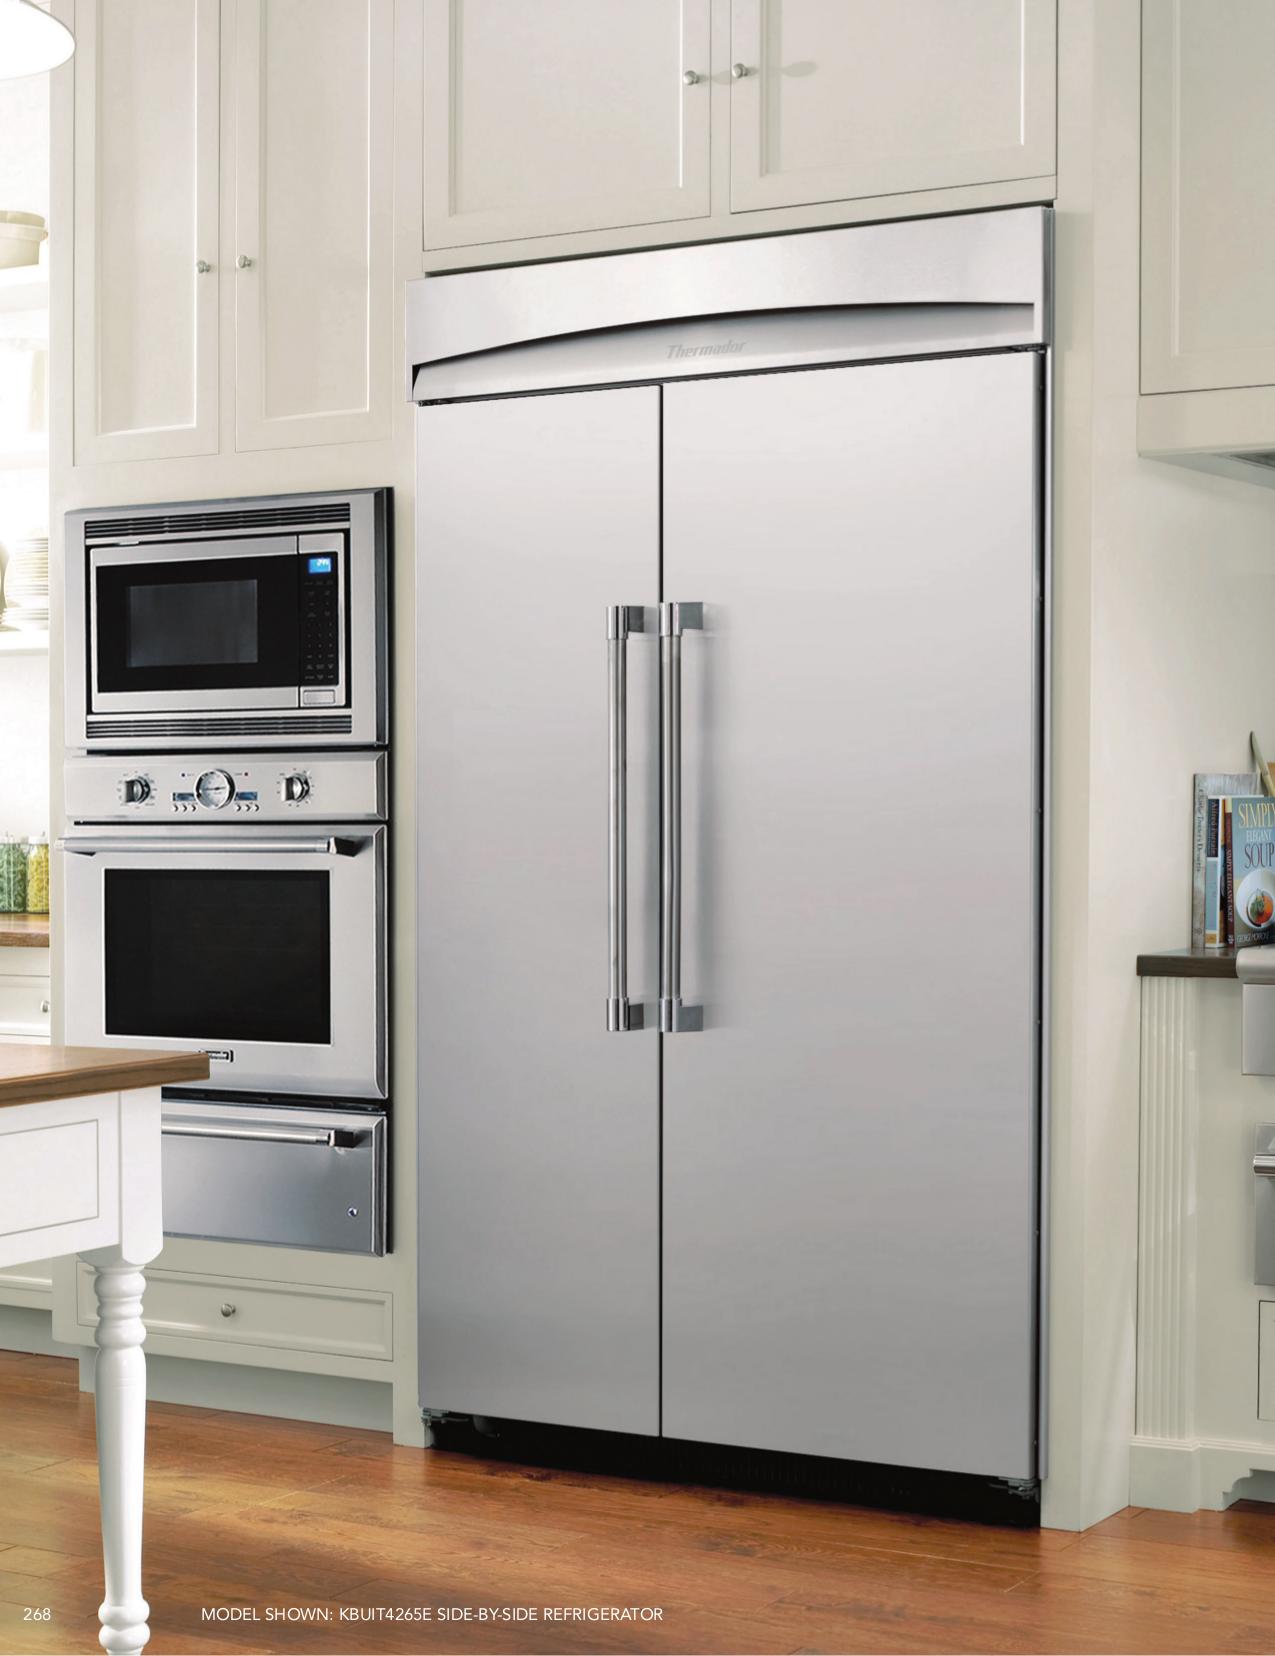 download free pdf for thermador kbuit4855e refrigerator manual rh umlib com thermador refrigerator owners manual thermador french door refrigerator manual